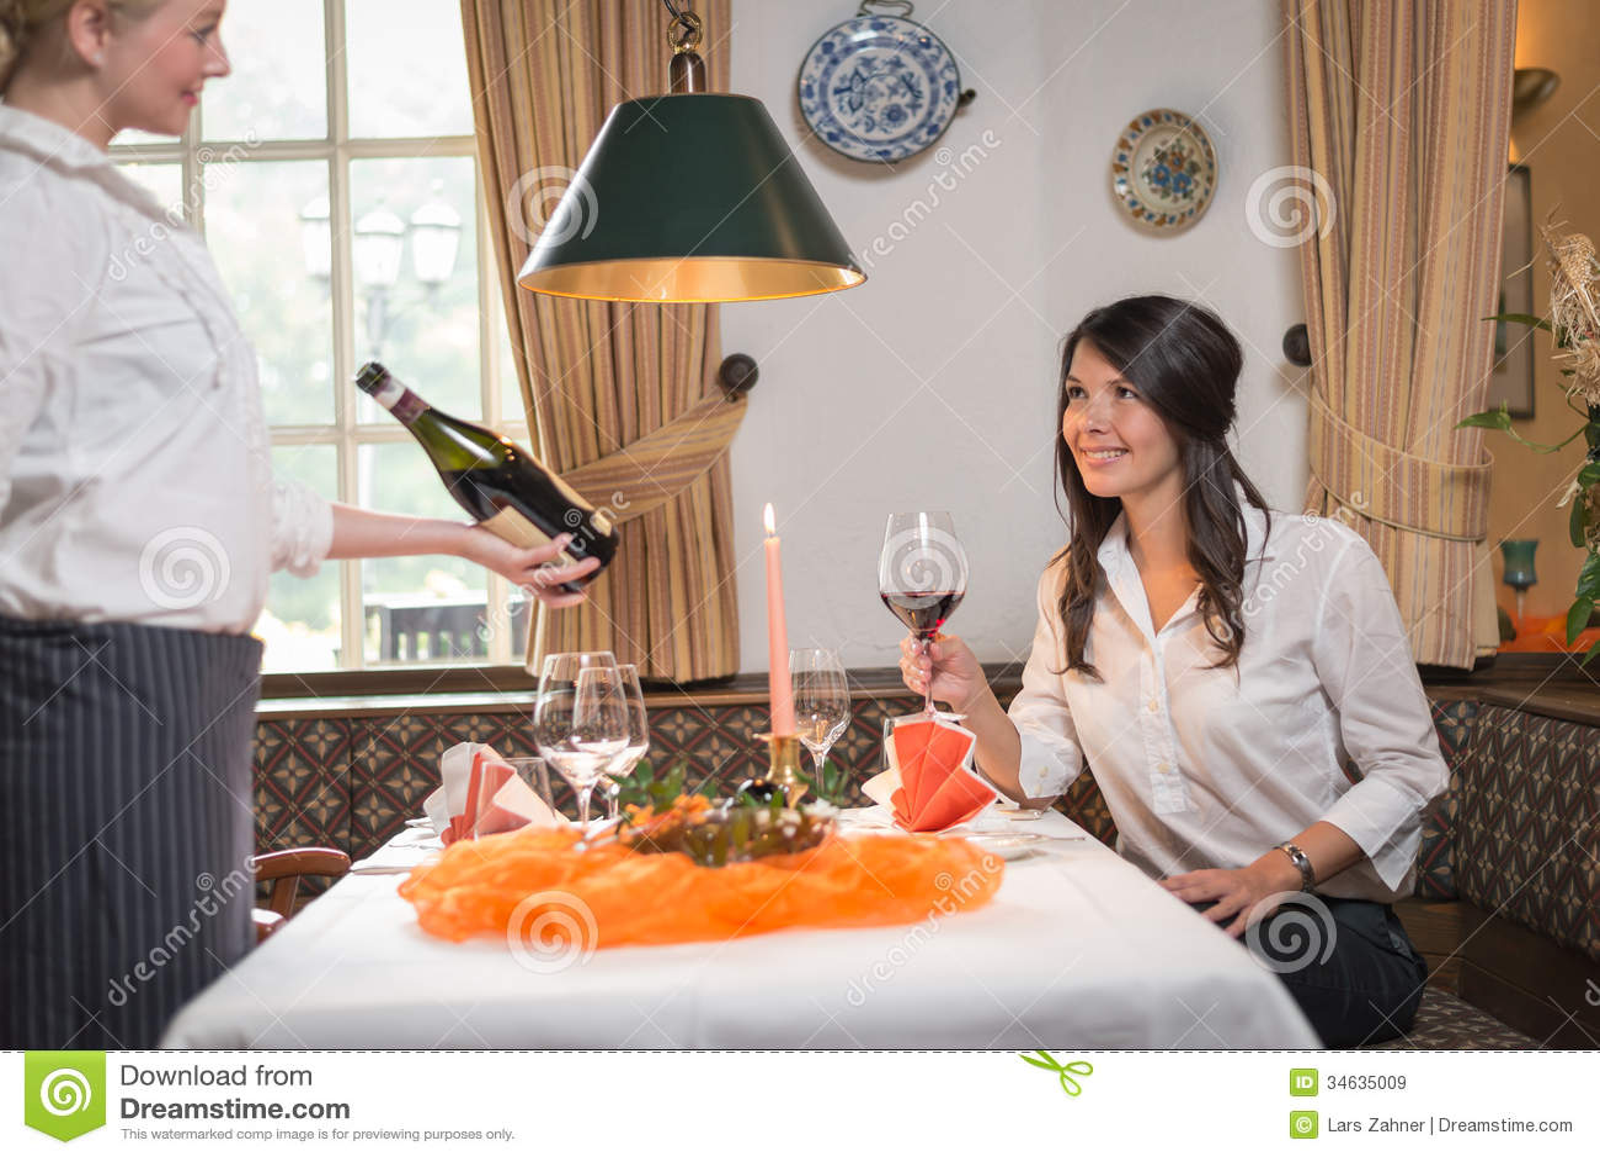 Waiter Serving Wine In A Fine Restaurant Royalty Free